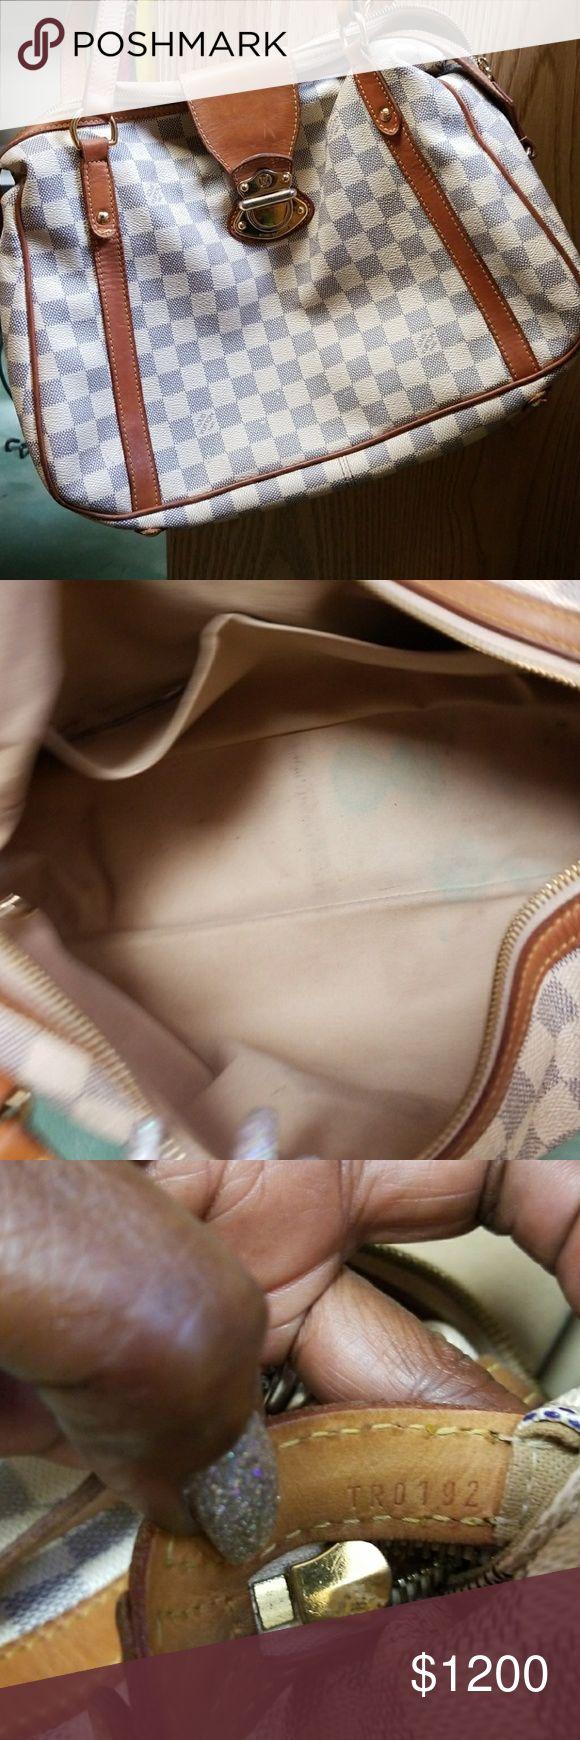 Azur stressa mm Louis vuition bag in used condition Louis Vuitton Bags Satchels